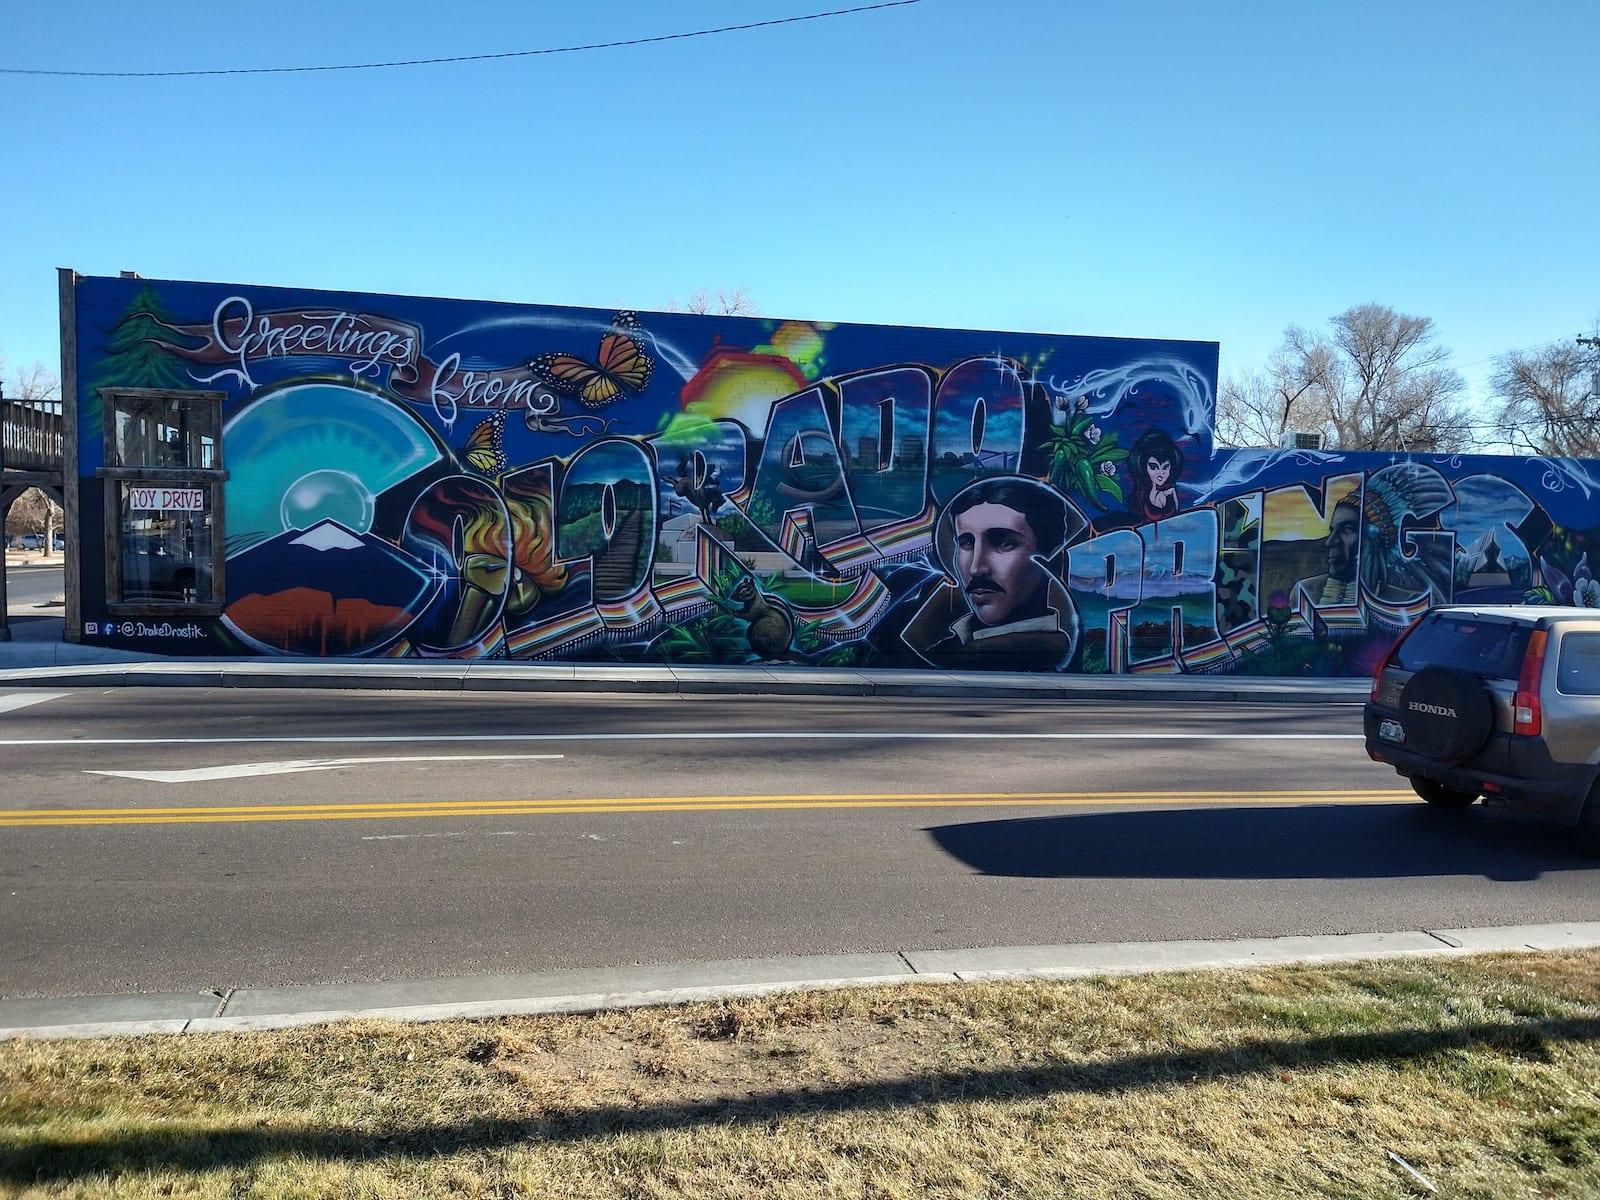 Colorado Springs Mural Greetings